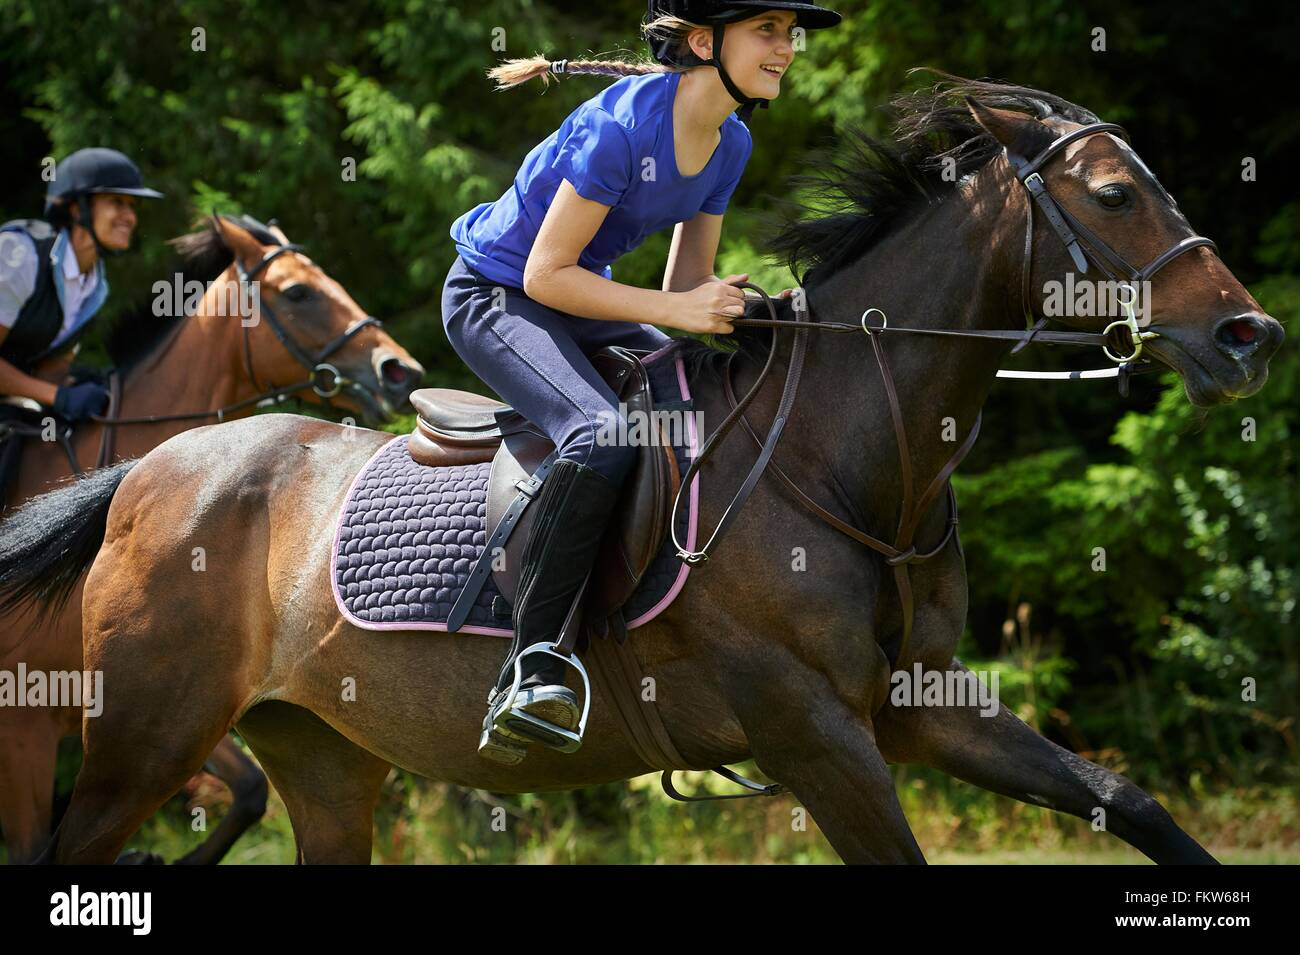 Vista lateral de la chica en caballo sonriente Imagen De Stock